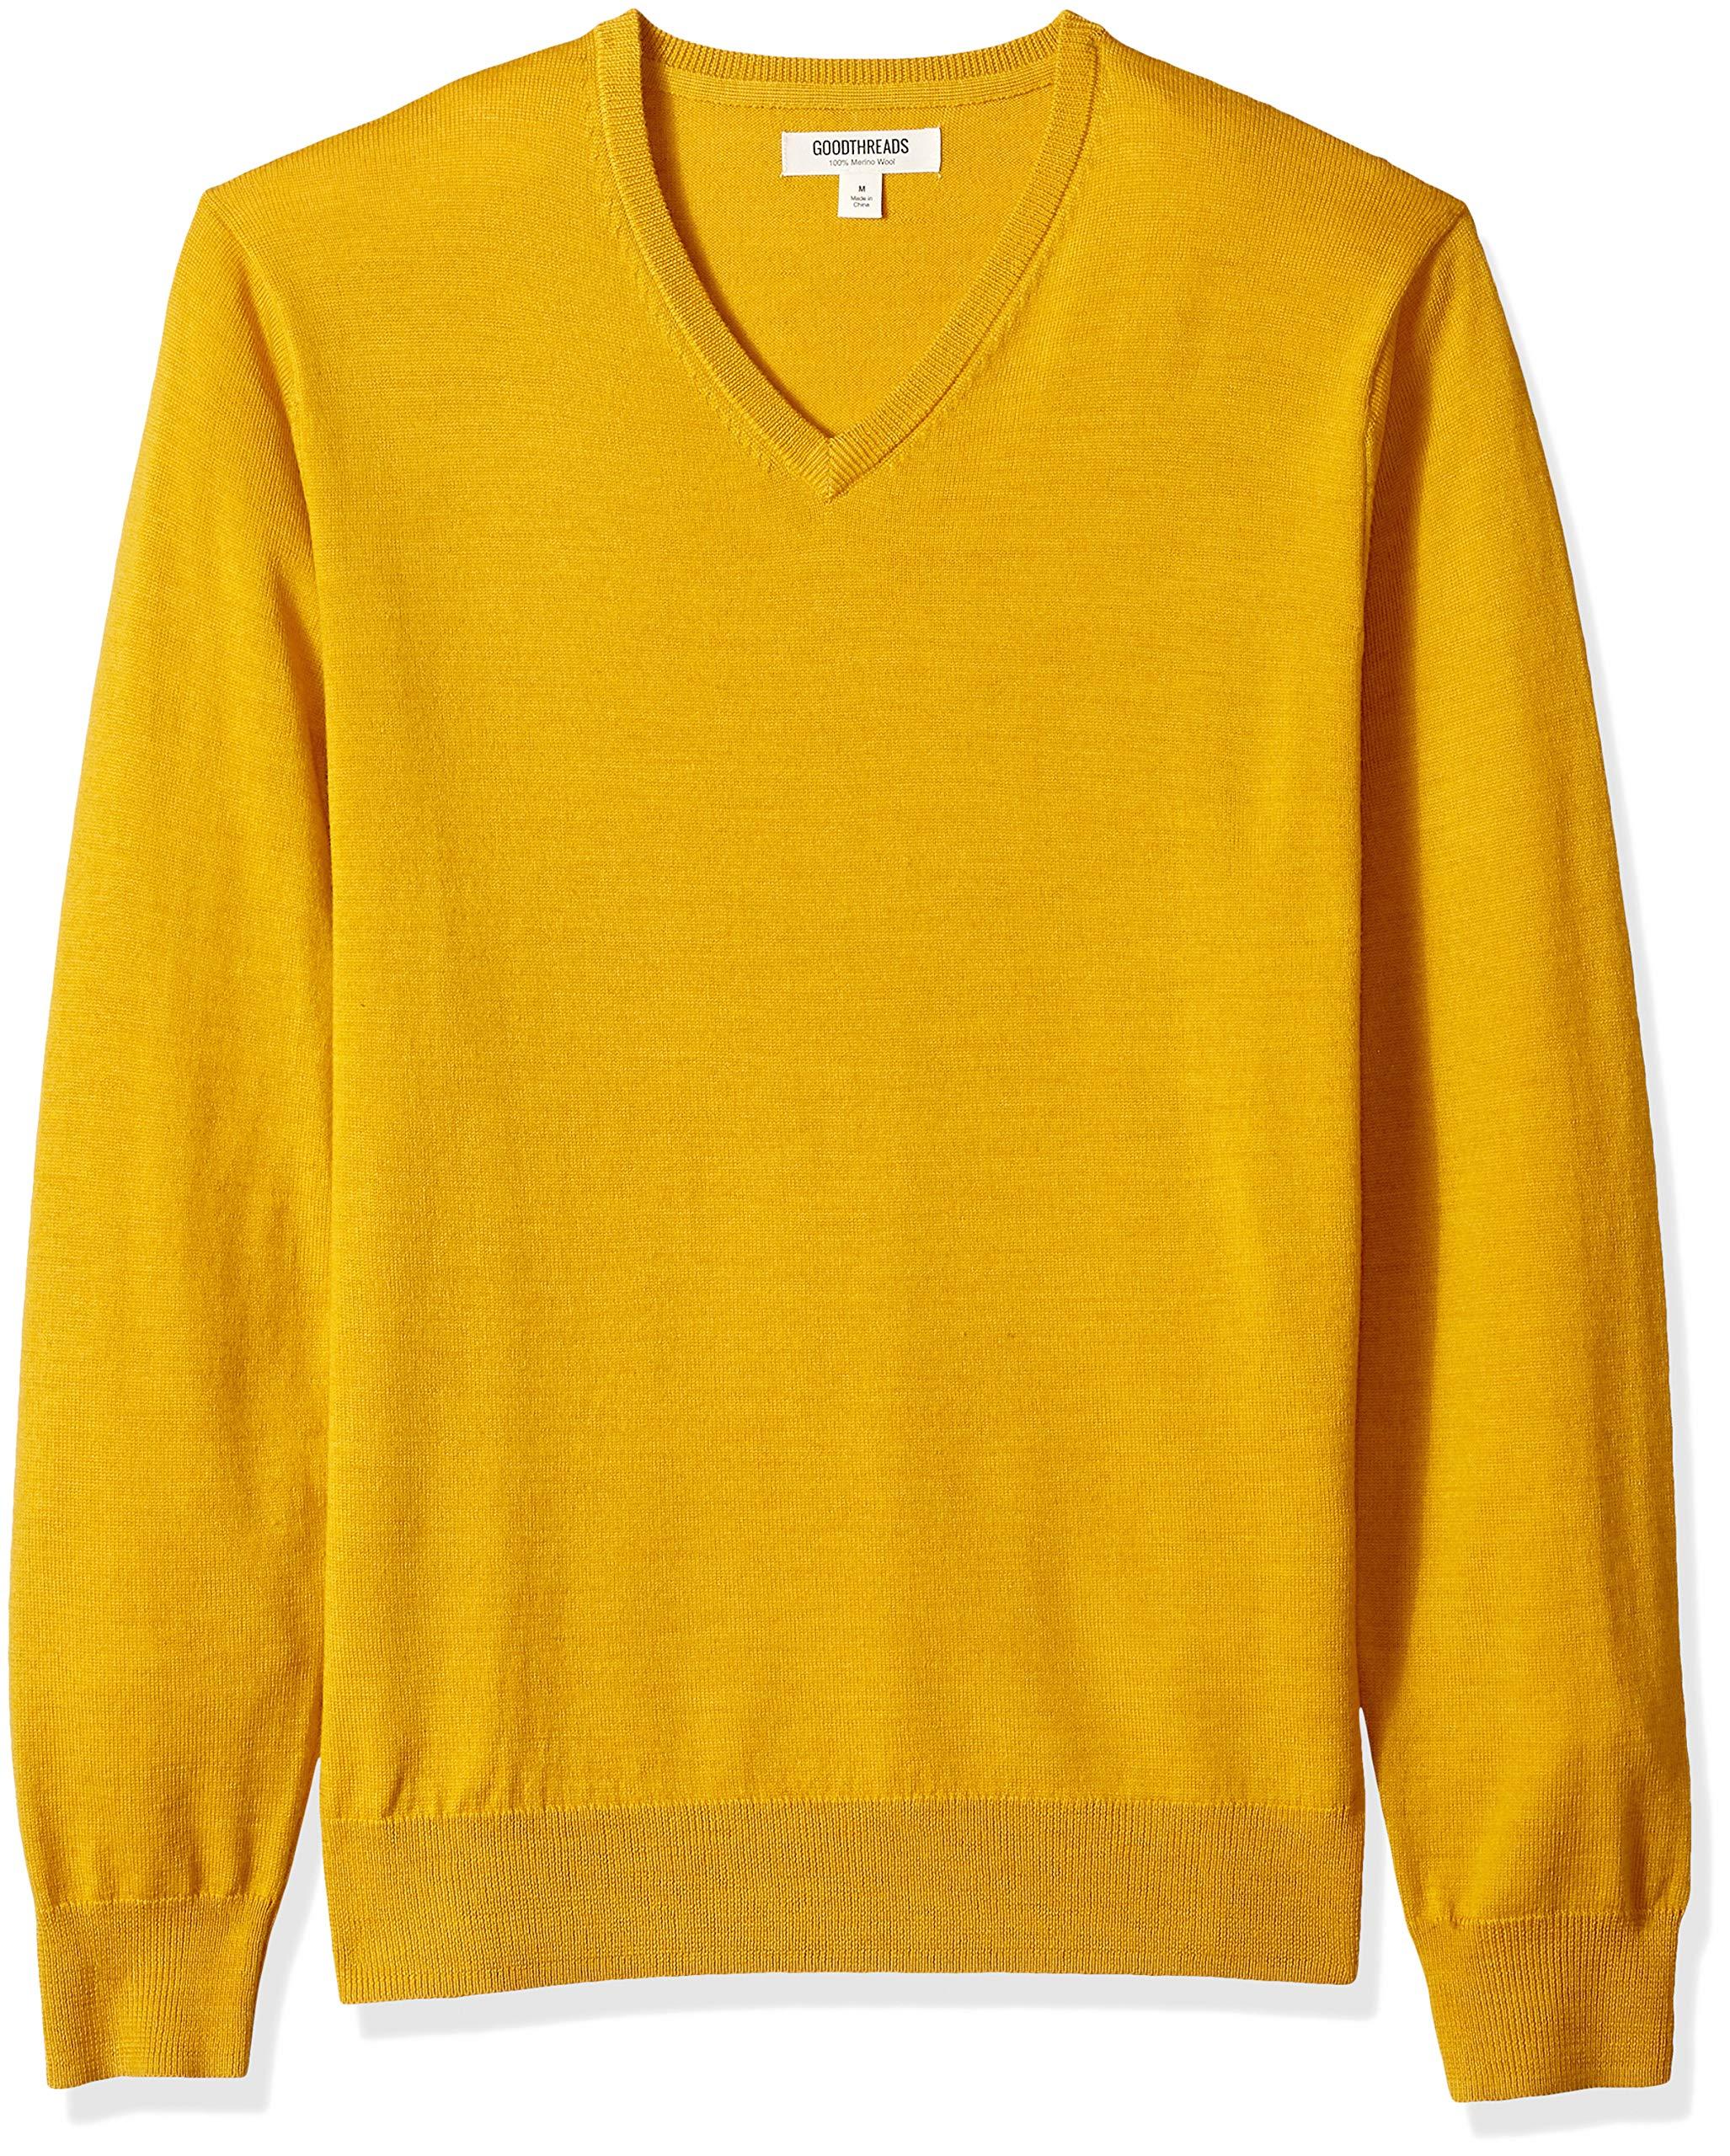 Goodthreads Men's Merino Wool V-Neck Sweater, Yellow, Large by Goodthreads